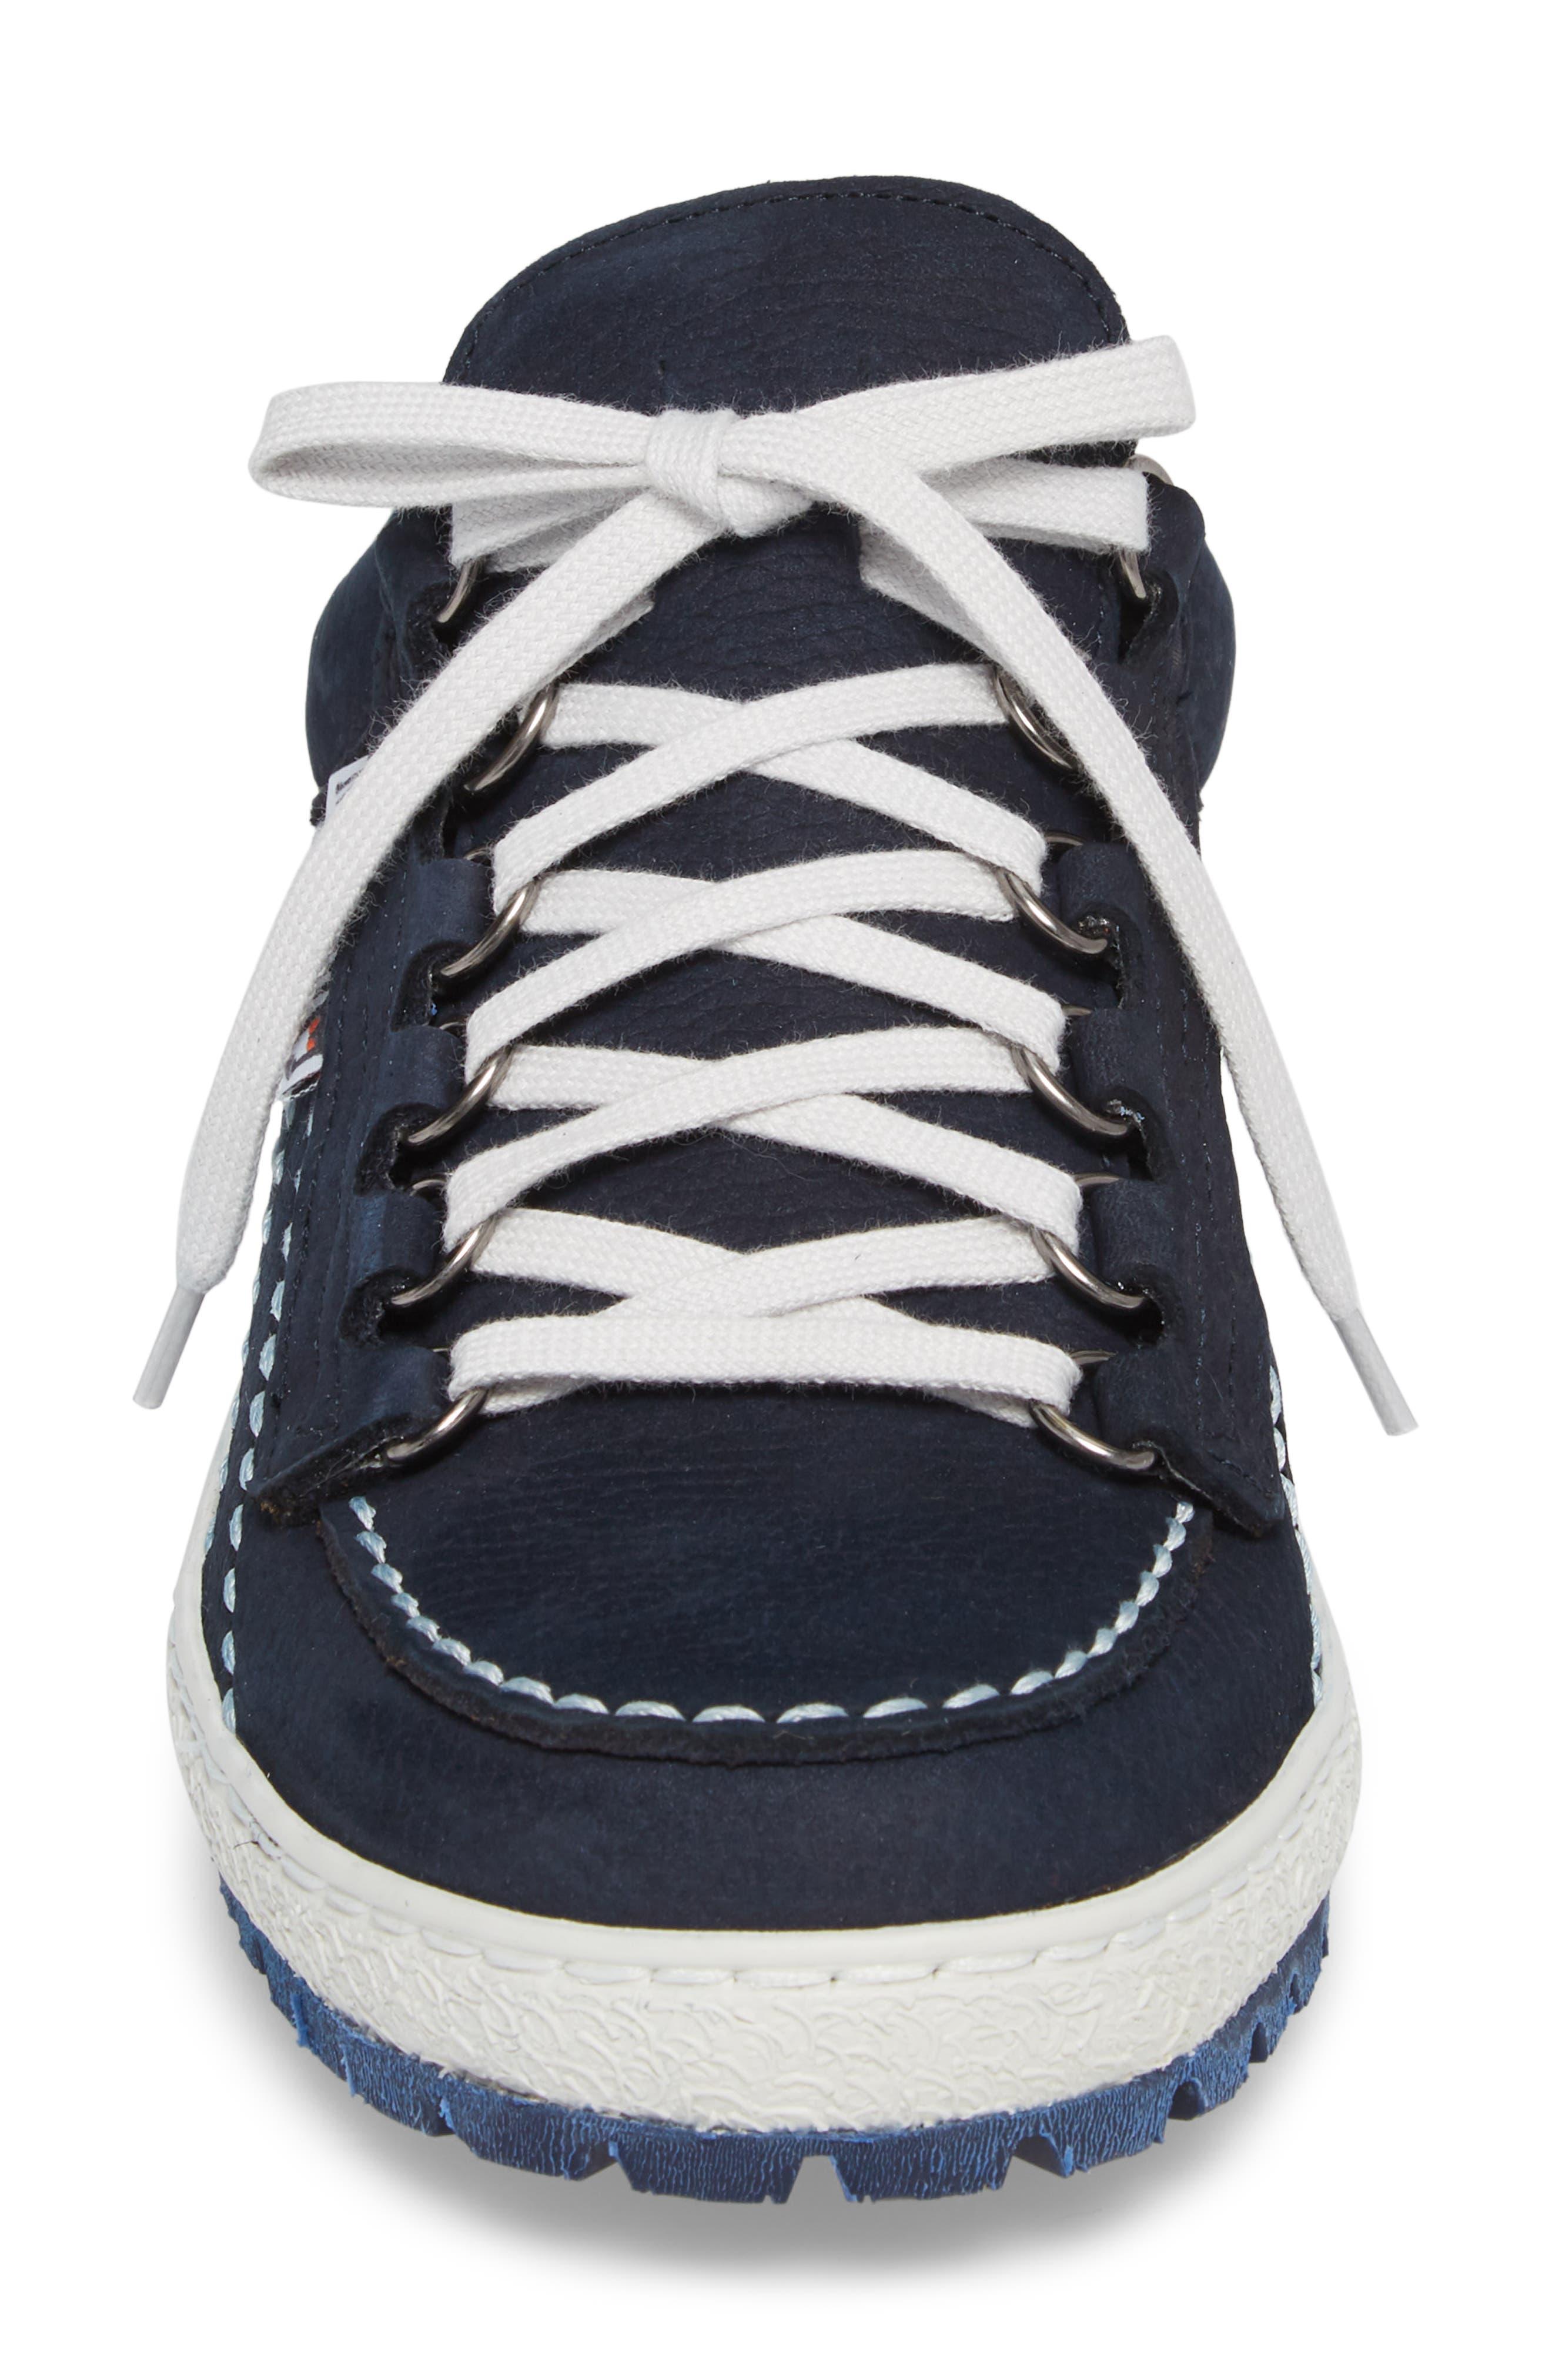 Rainbow Sneaker,                             Alternate thumbnail 4, color,                             Navy